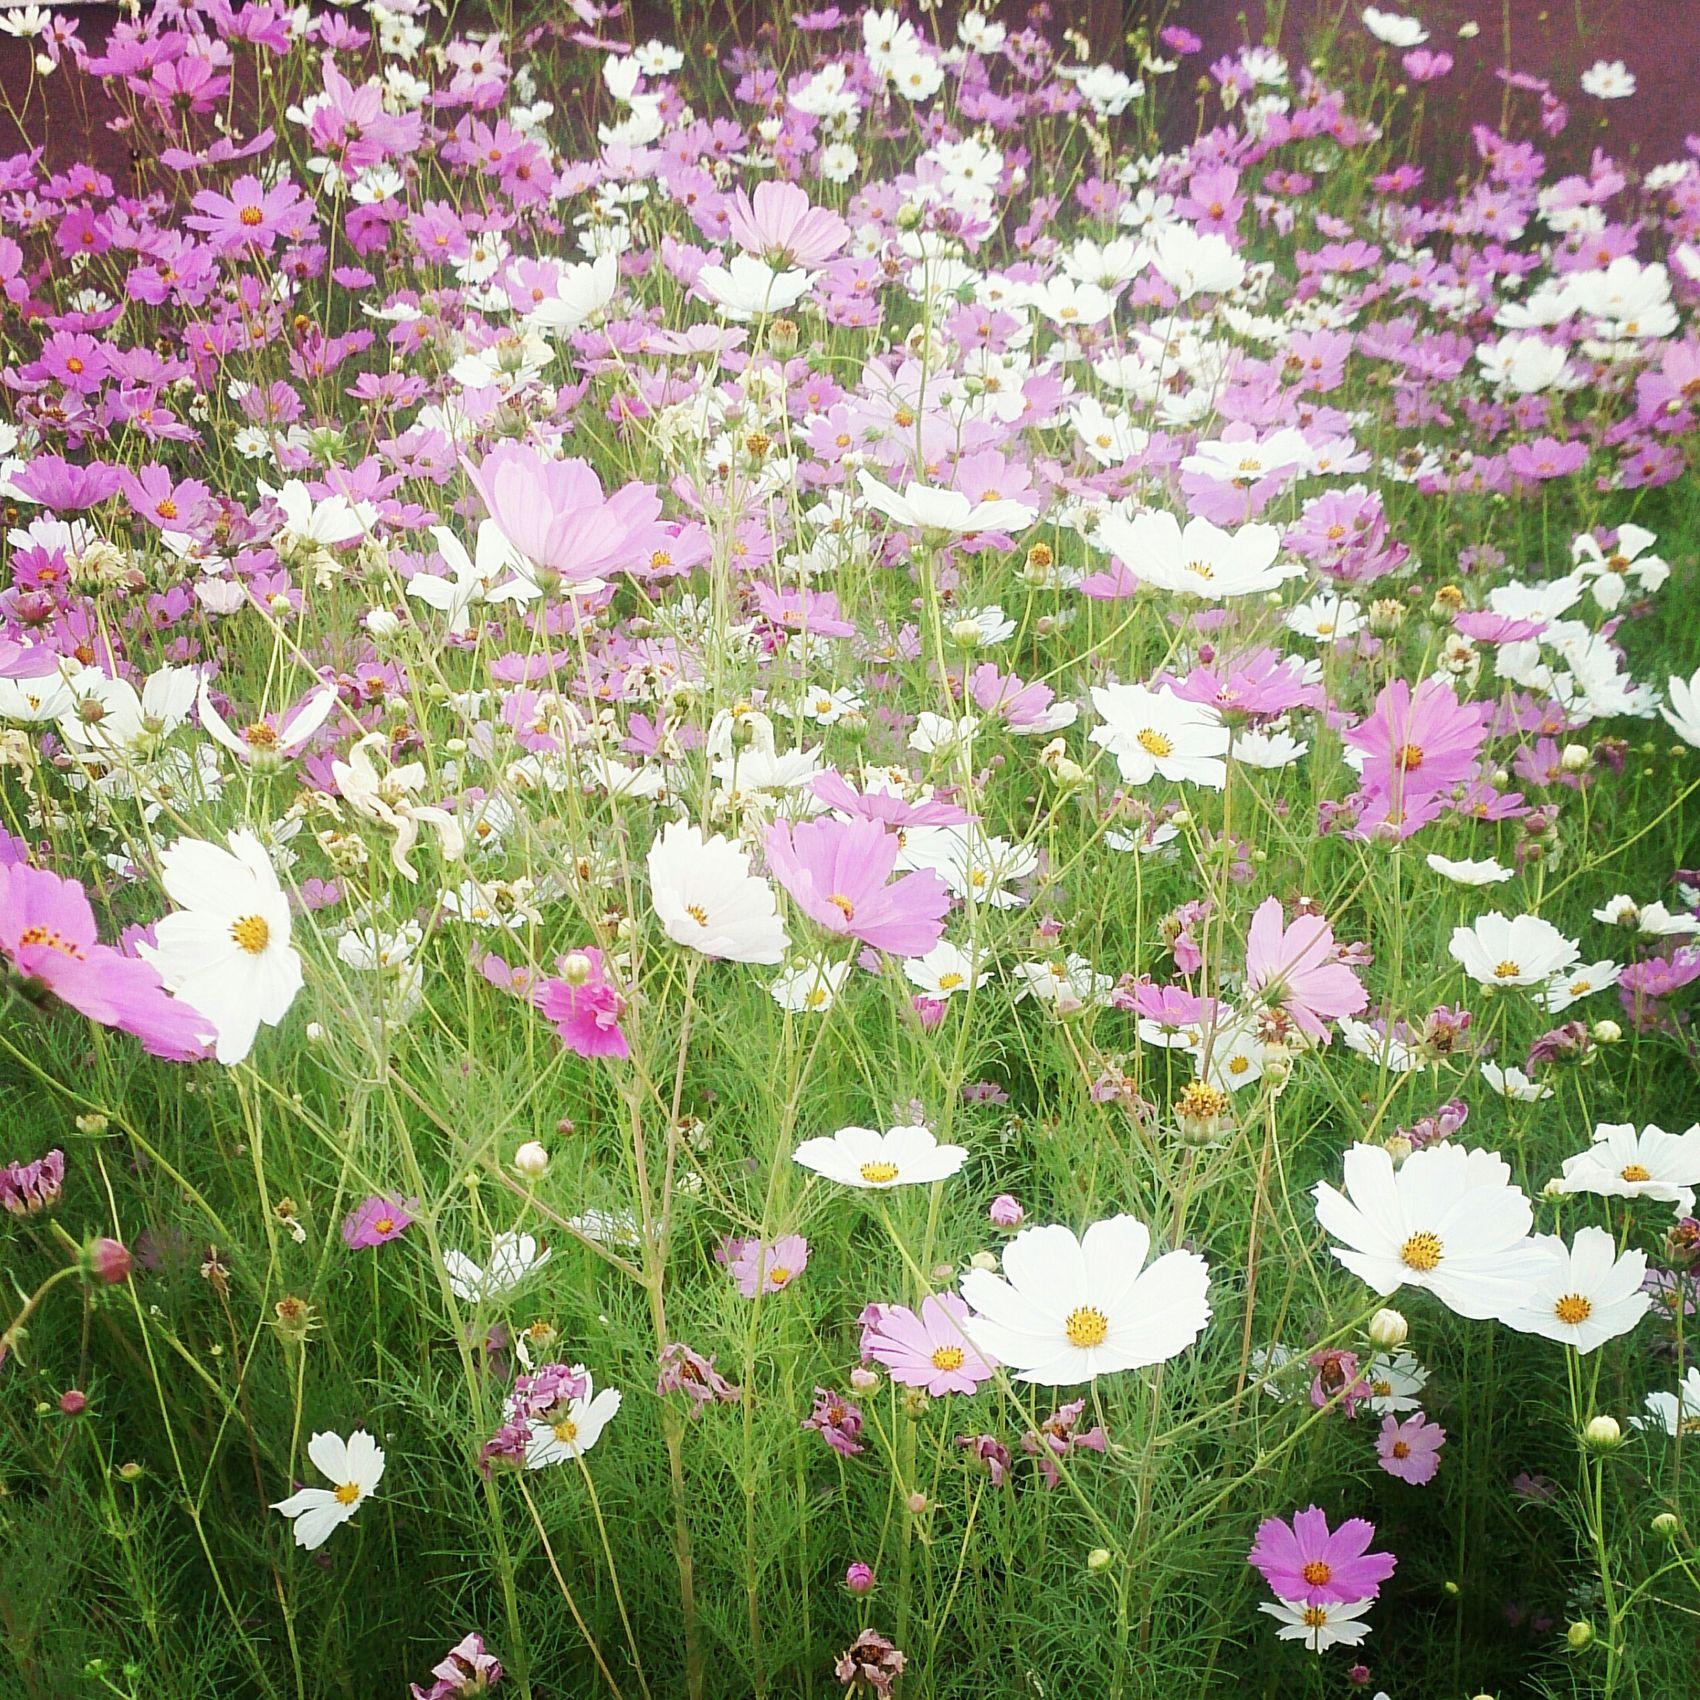 Flowers Beatiful Nature Sunnyday☀️ Colors EyeEm Nature Lover EyeEm Gallery Newphotographer